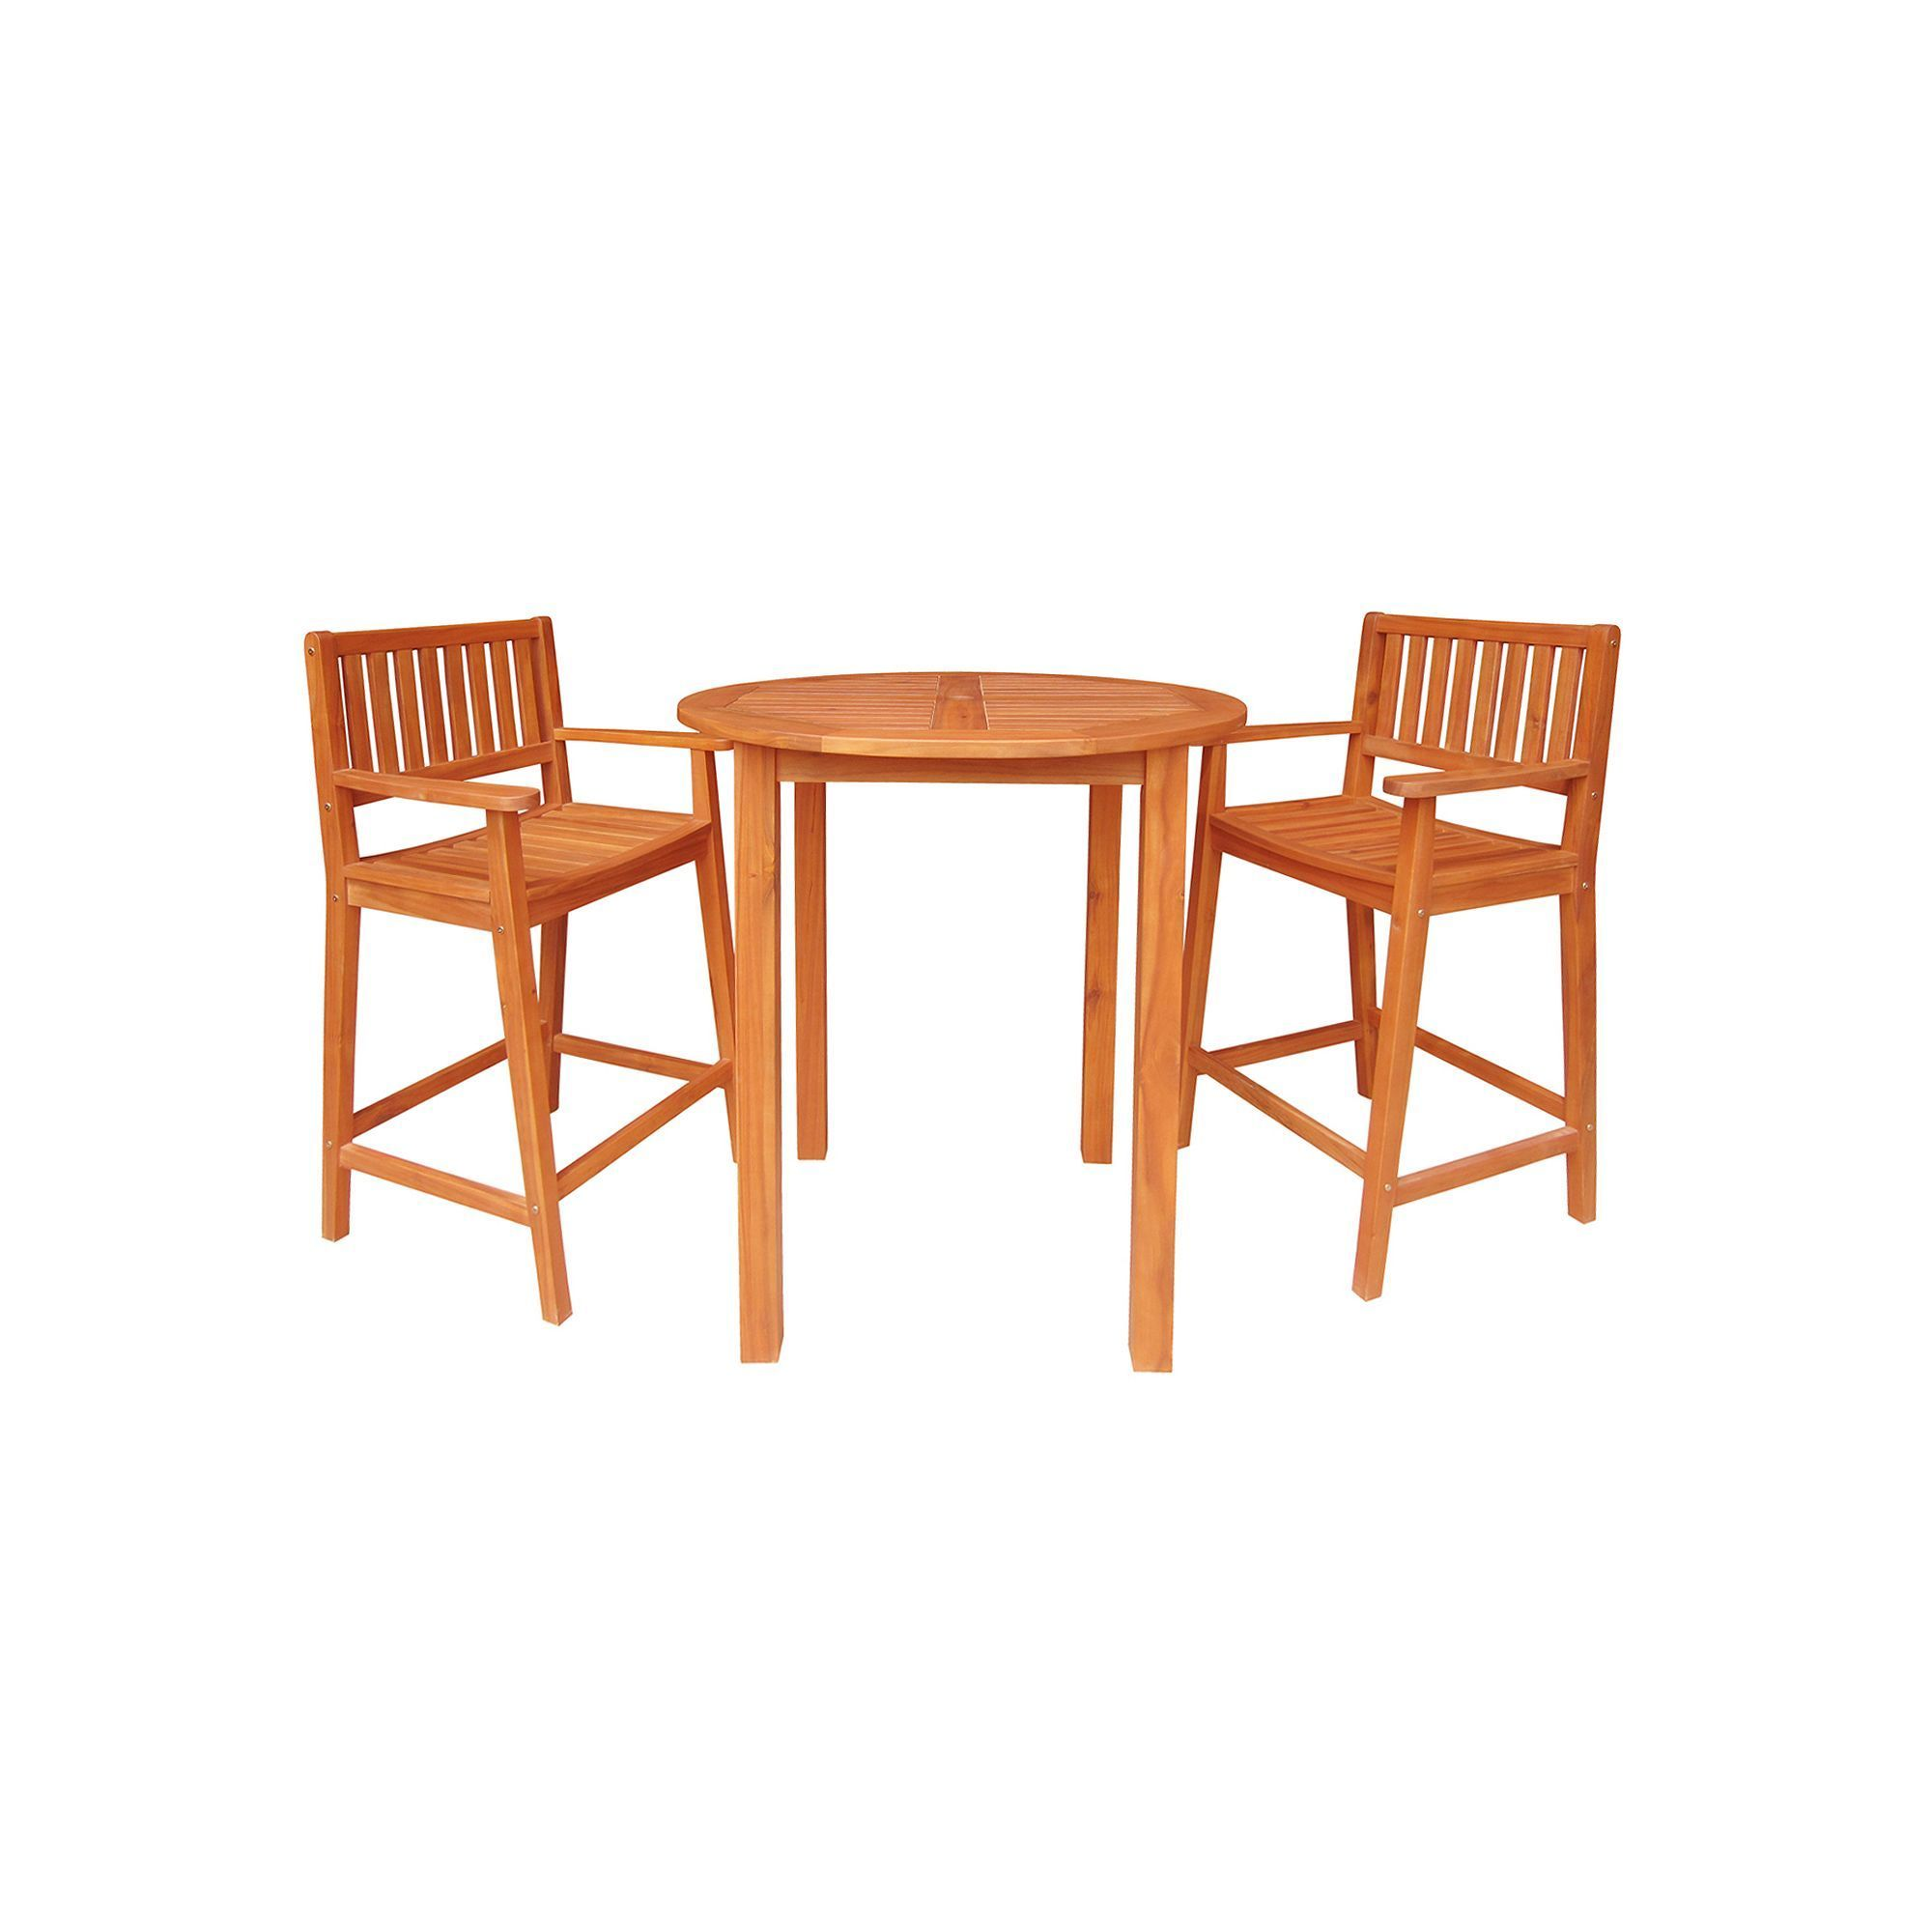 Outdoor 3-pc. Contemporary Bar Set, Brown   Patio dining ...